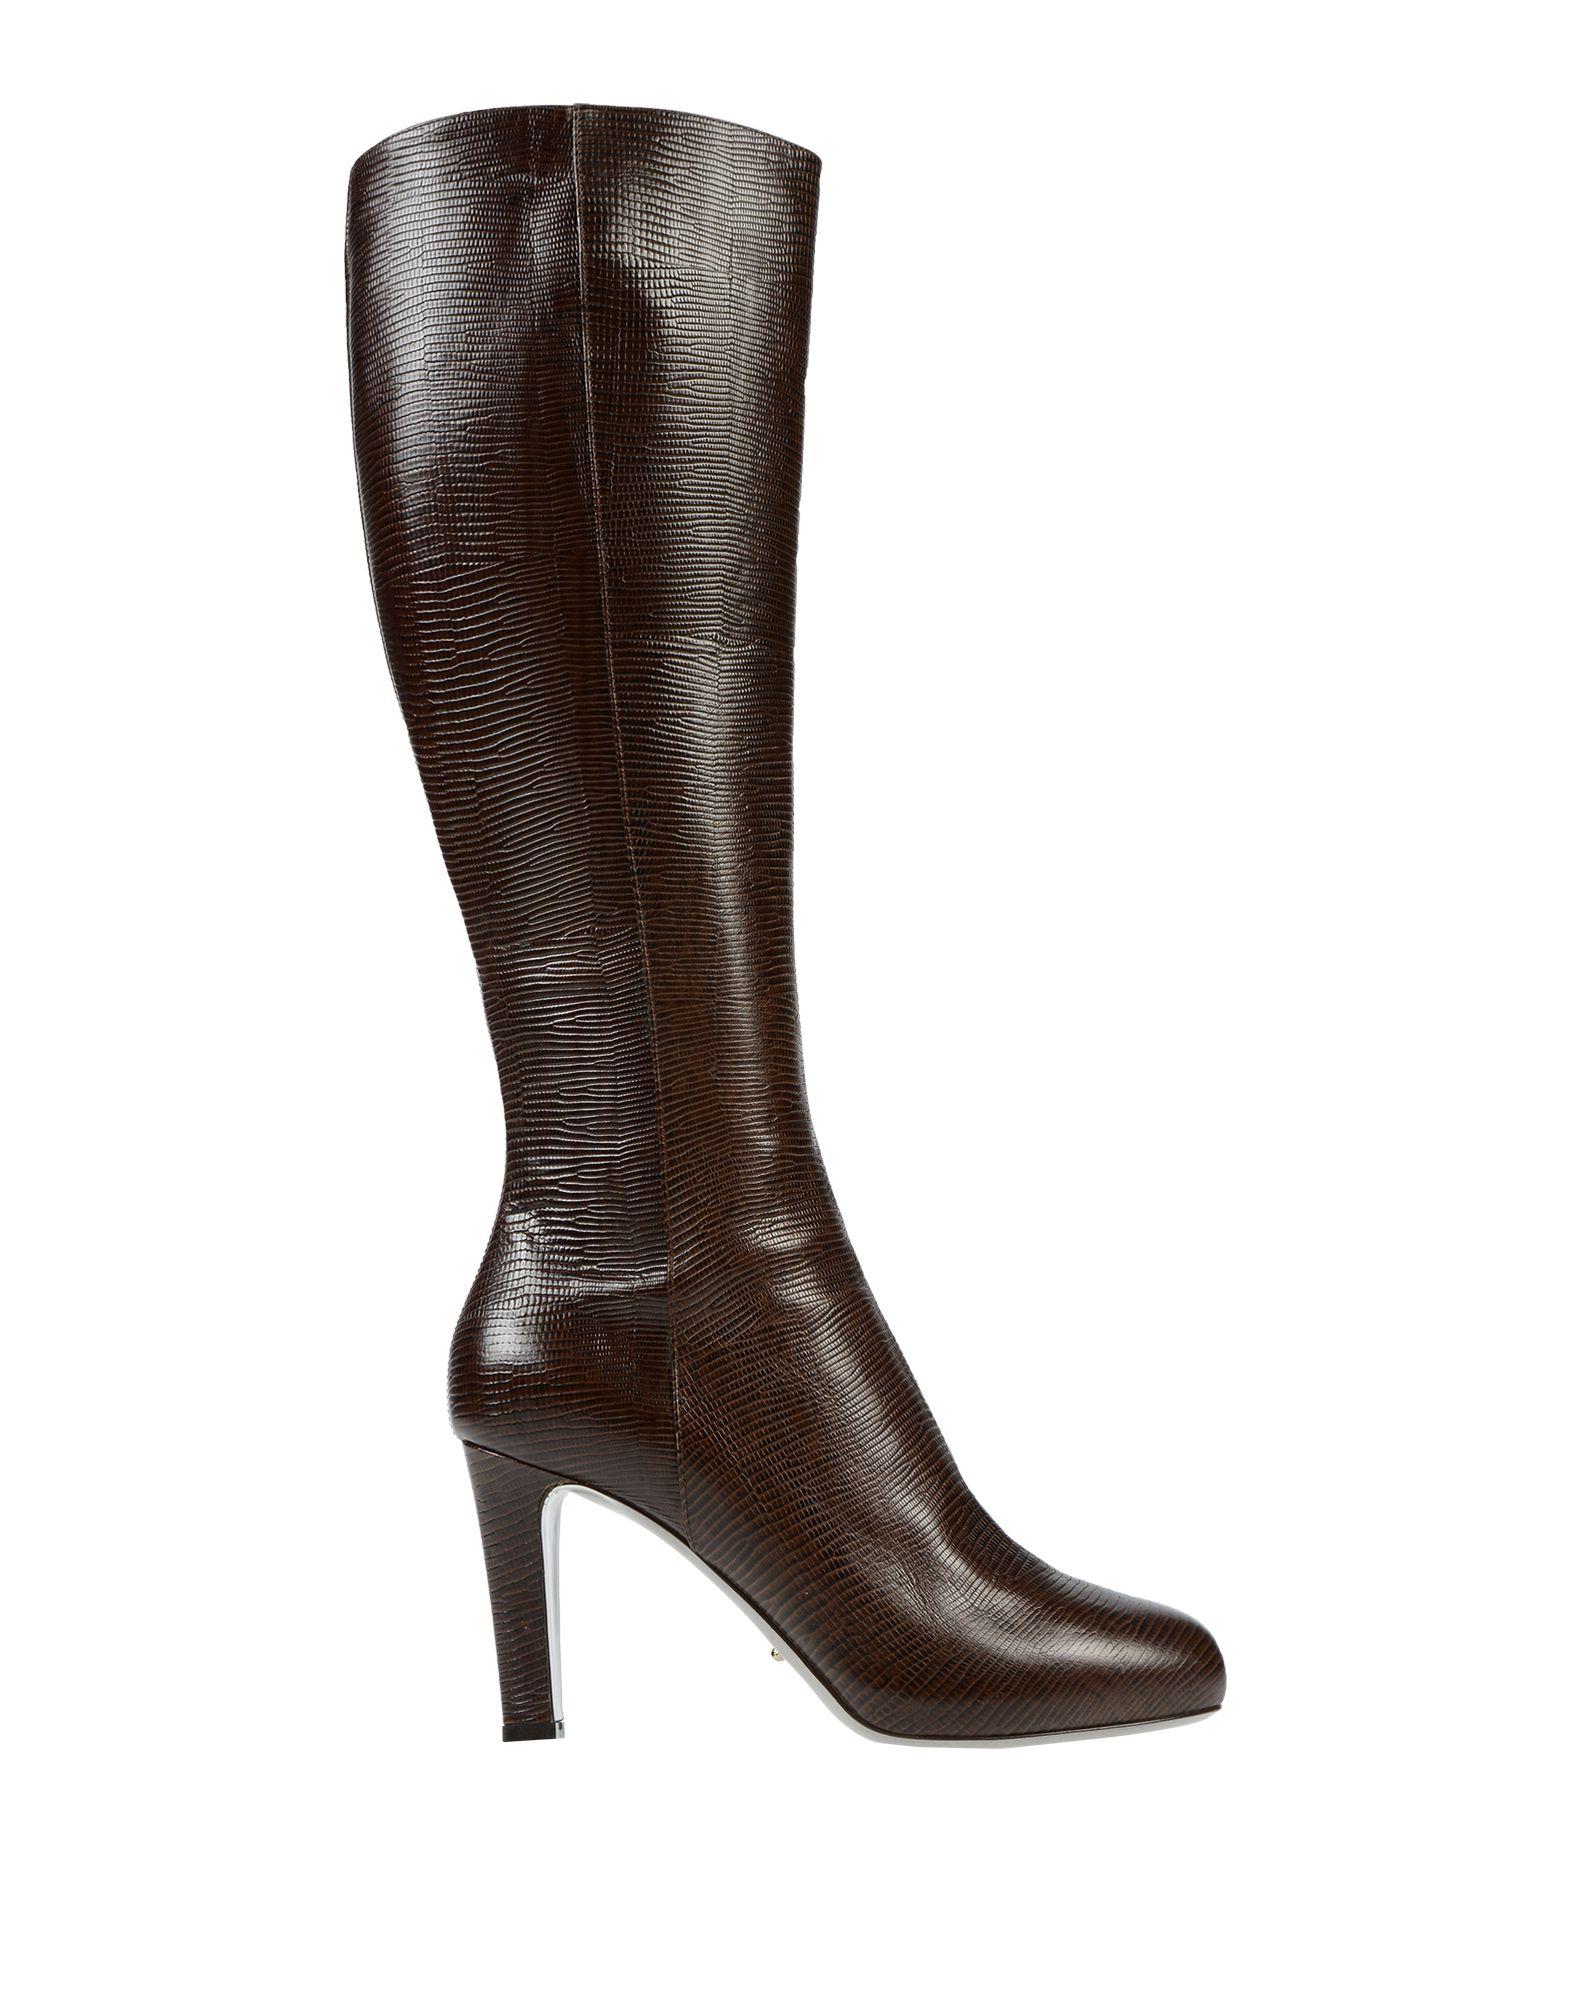 Sergio Rossi Boots - Women on Sergio Rossi Boots online on Women  Australia - 11547200WG 85d515